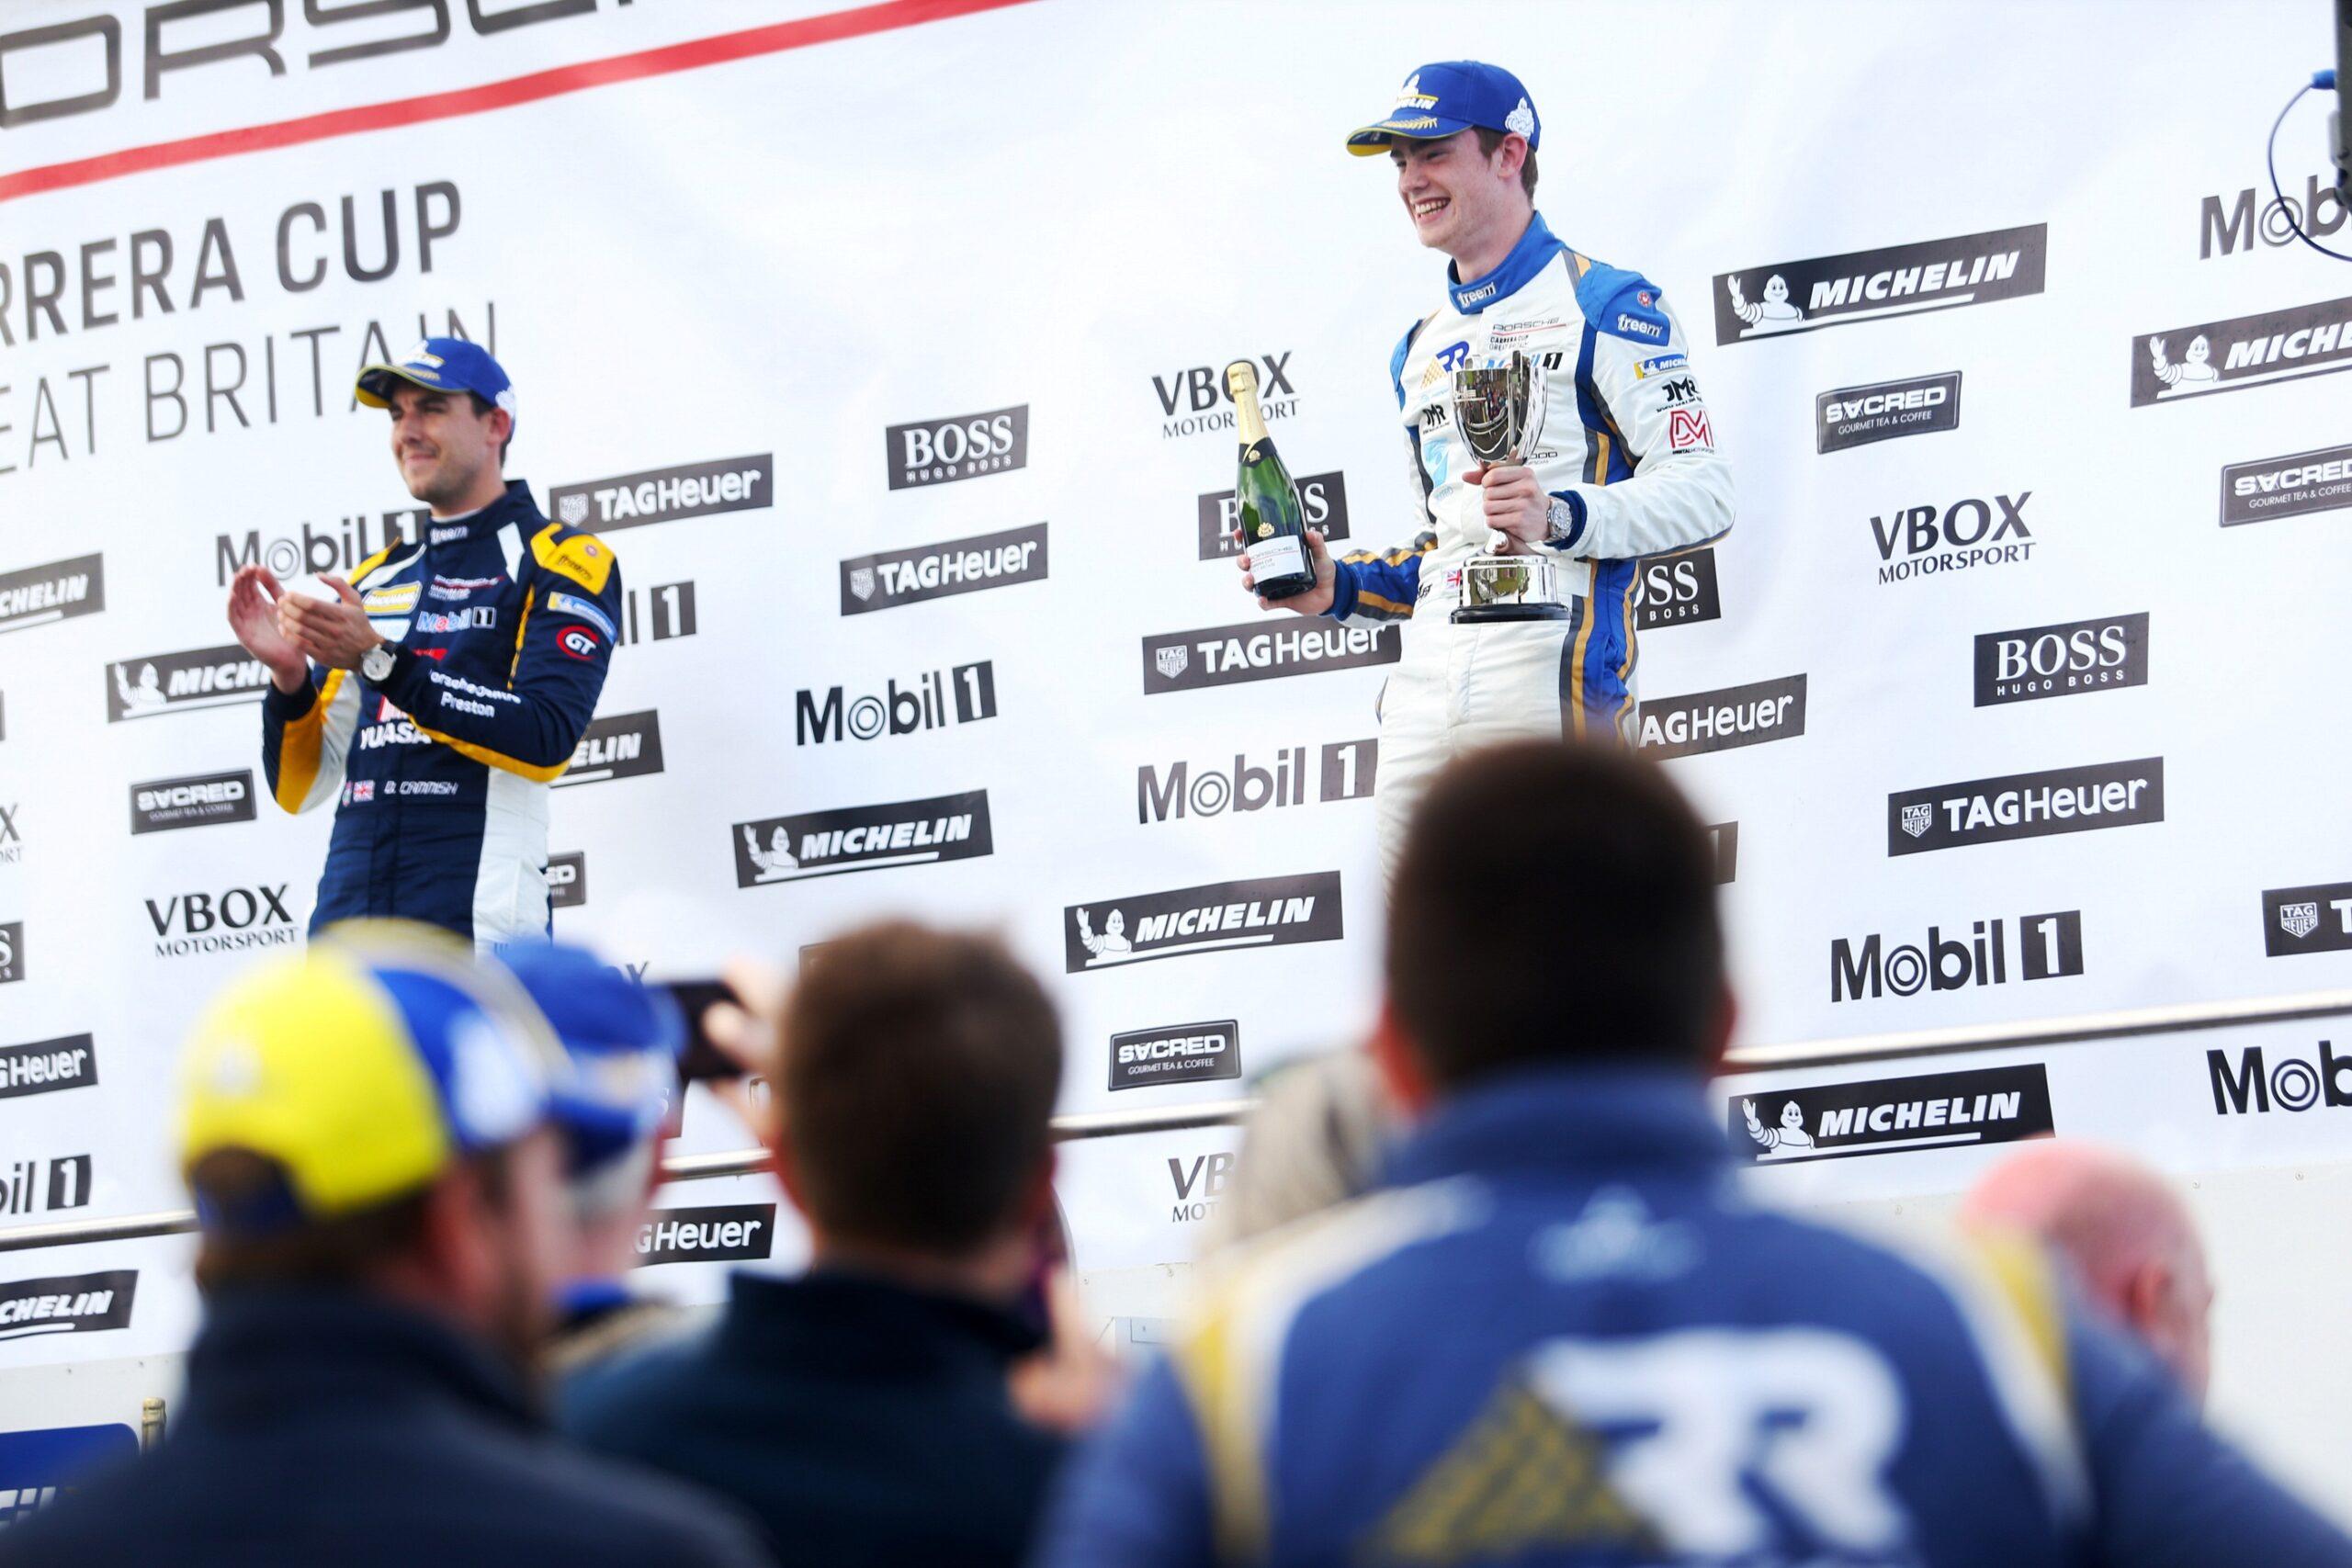 Pole and podium for Richardson Racing at Knockhill